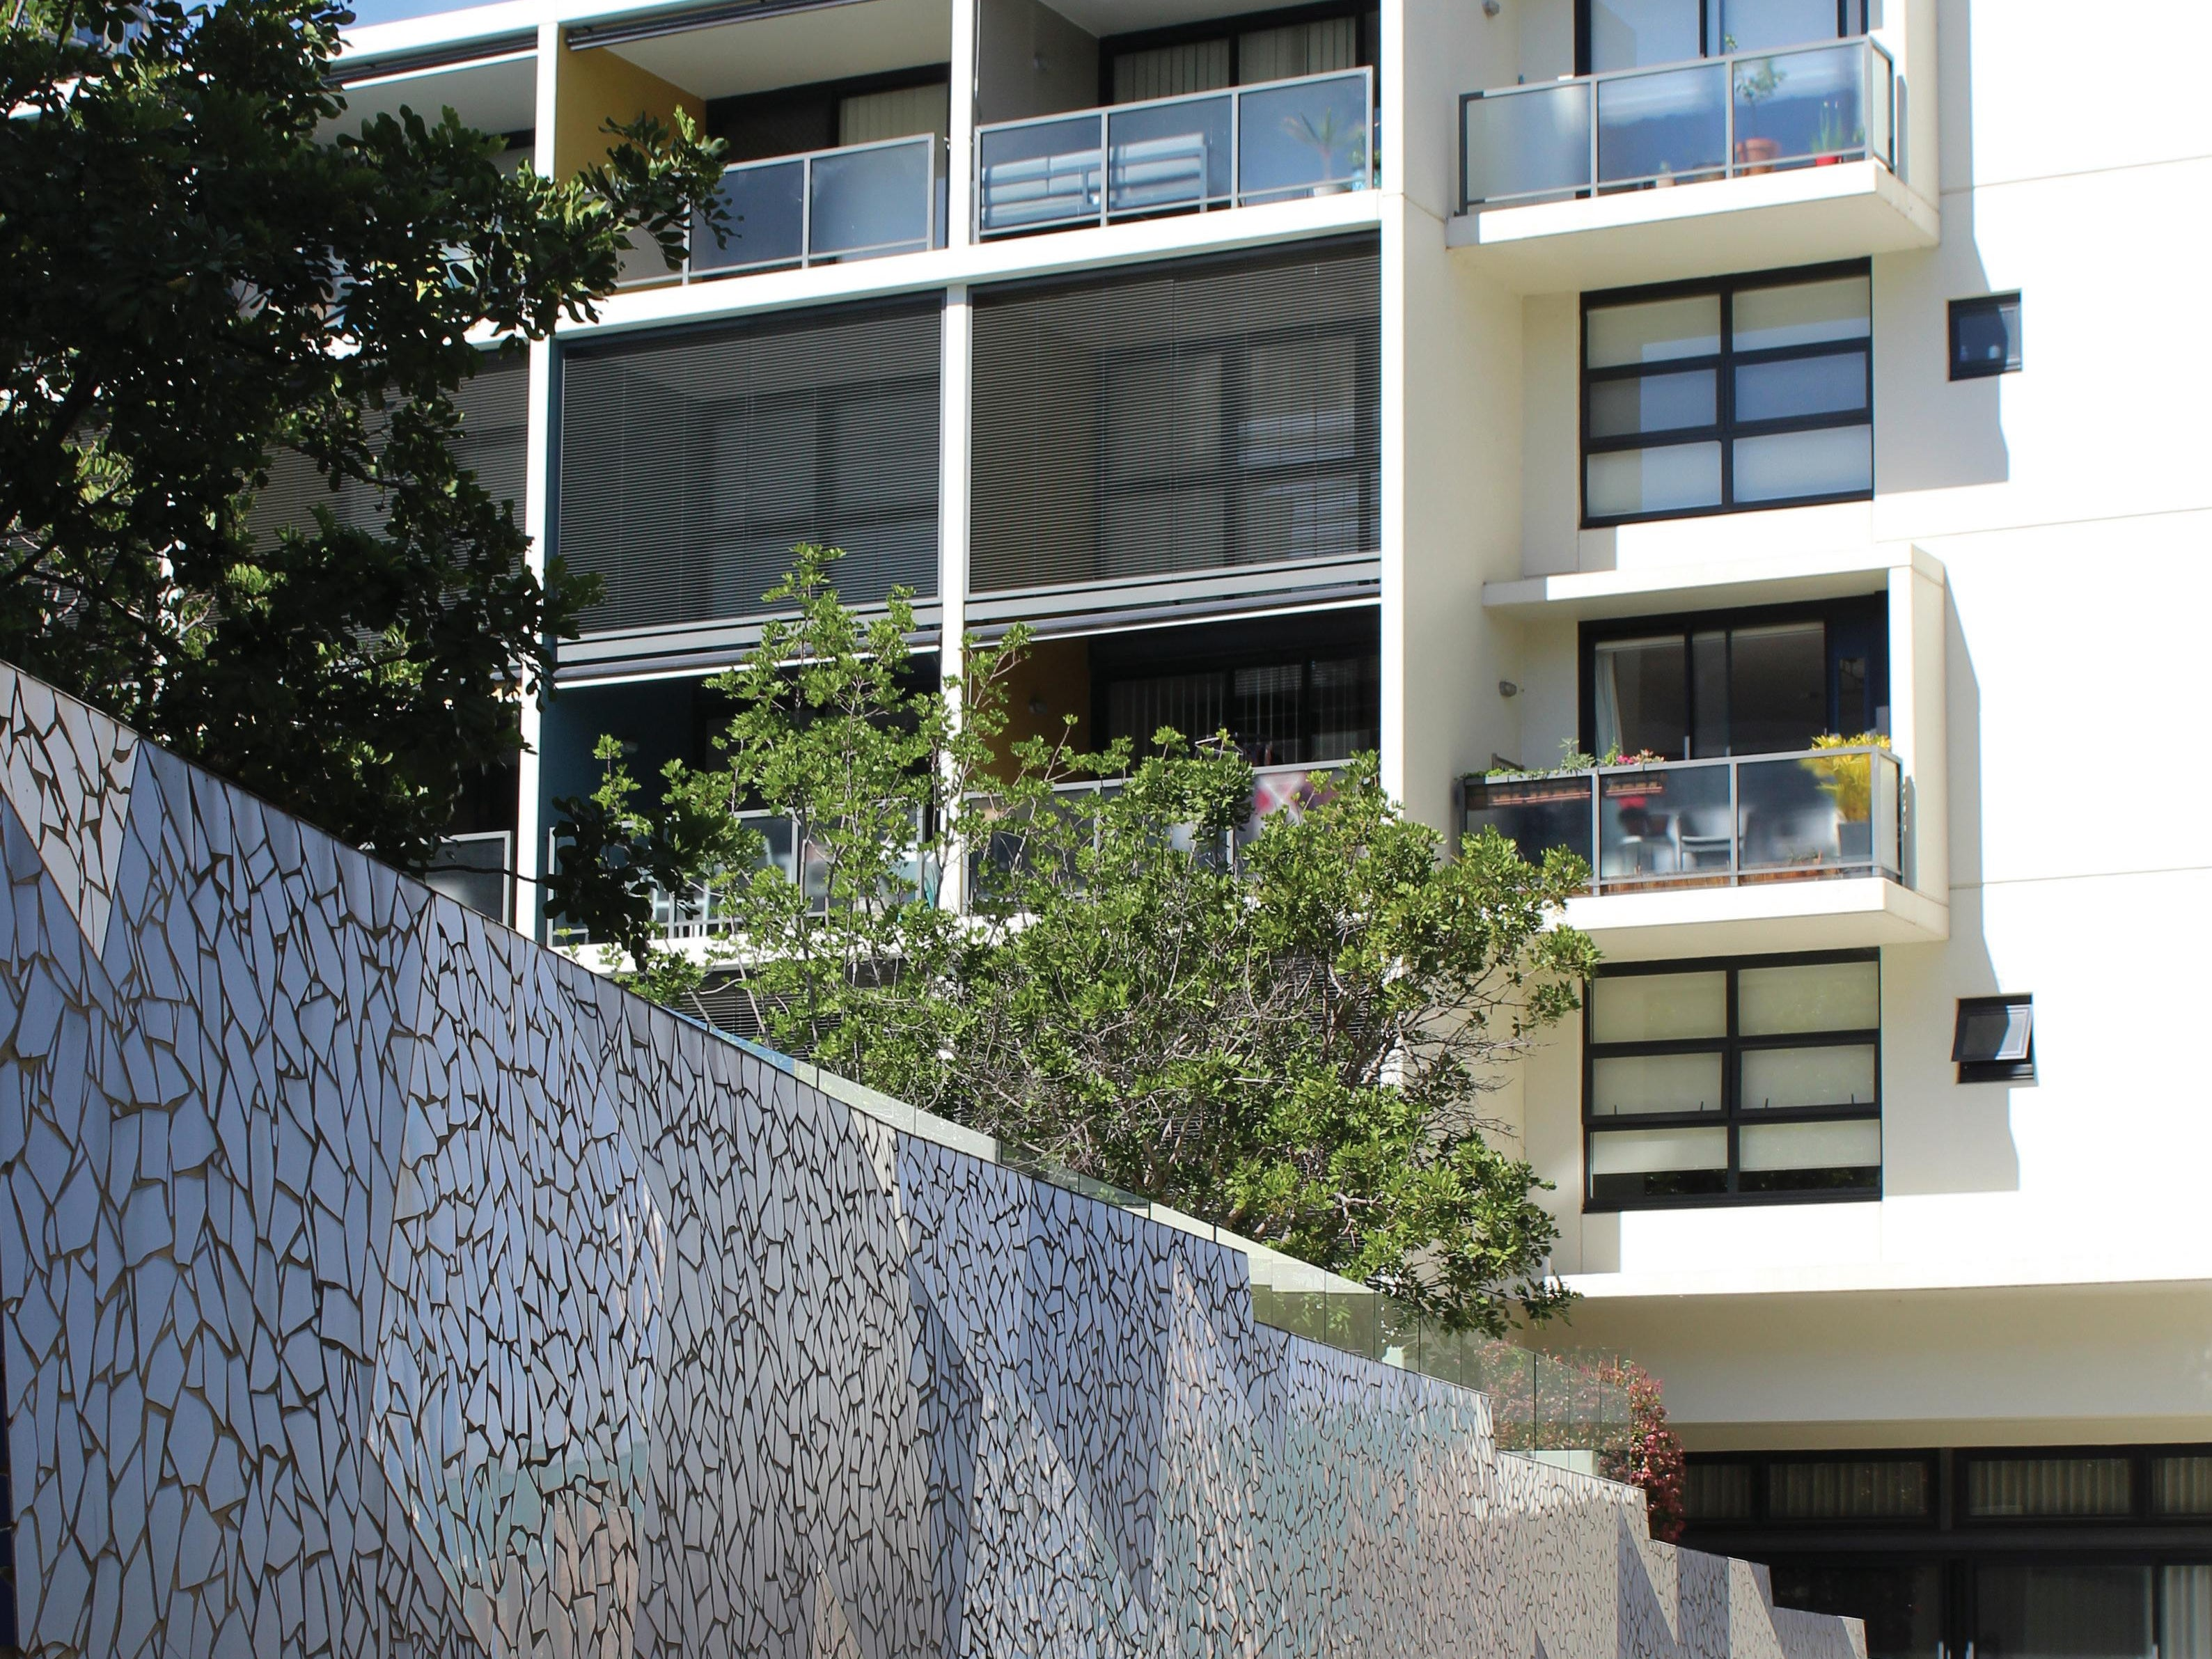 Page 16 of Building Magnificent Communities: Linc Apartments